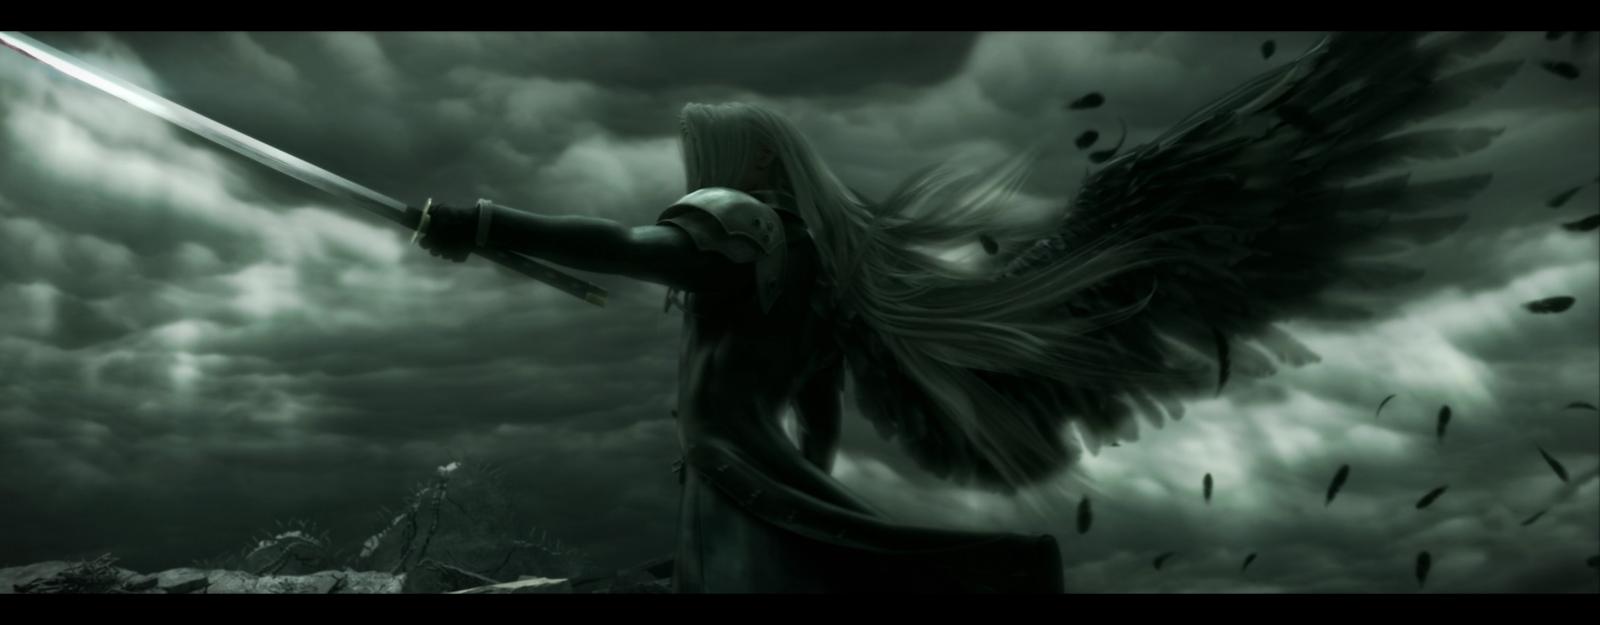 Final Fantasy VIIACC Sephiroth by HolloW Darklight on 1600x625